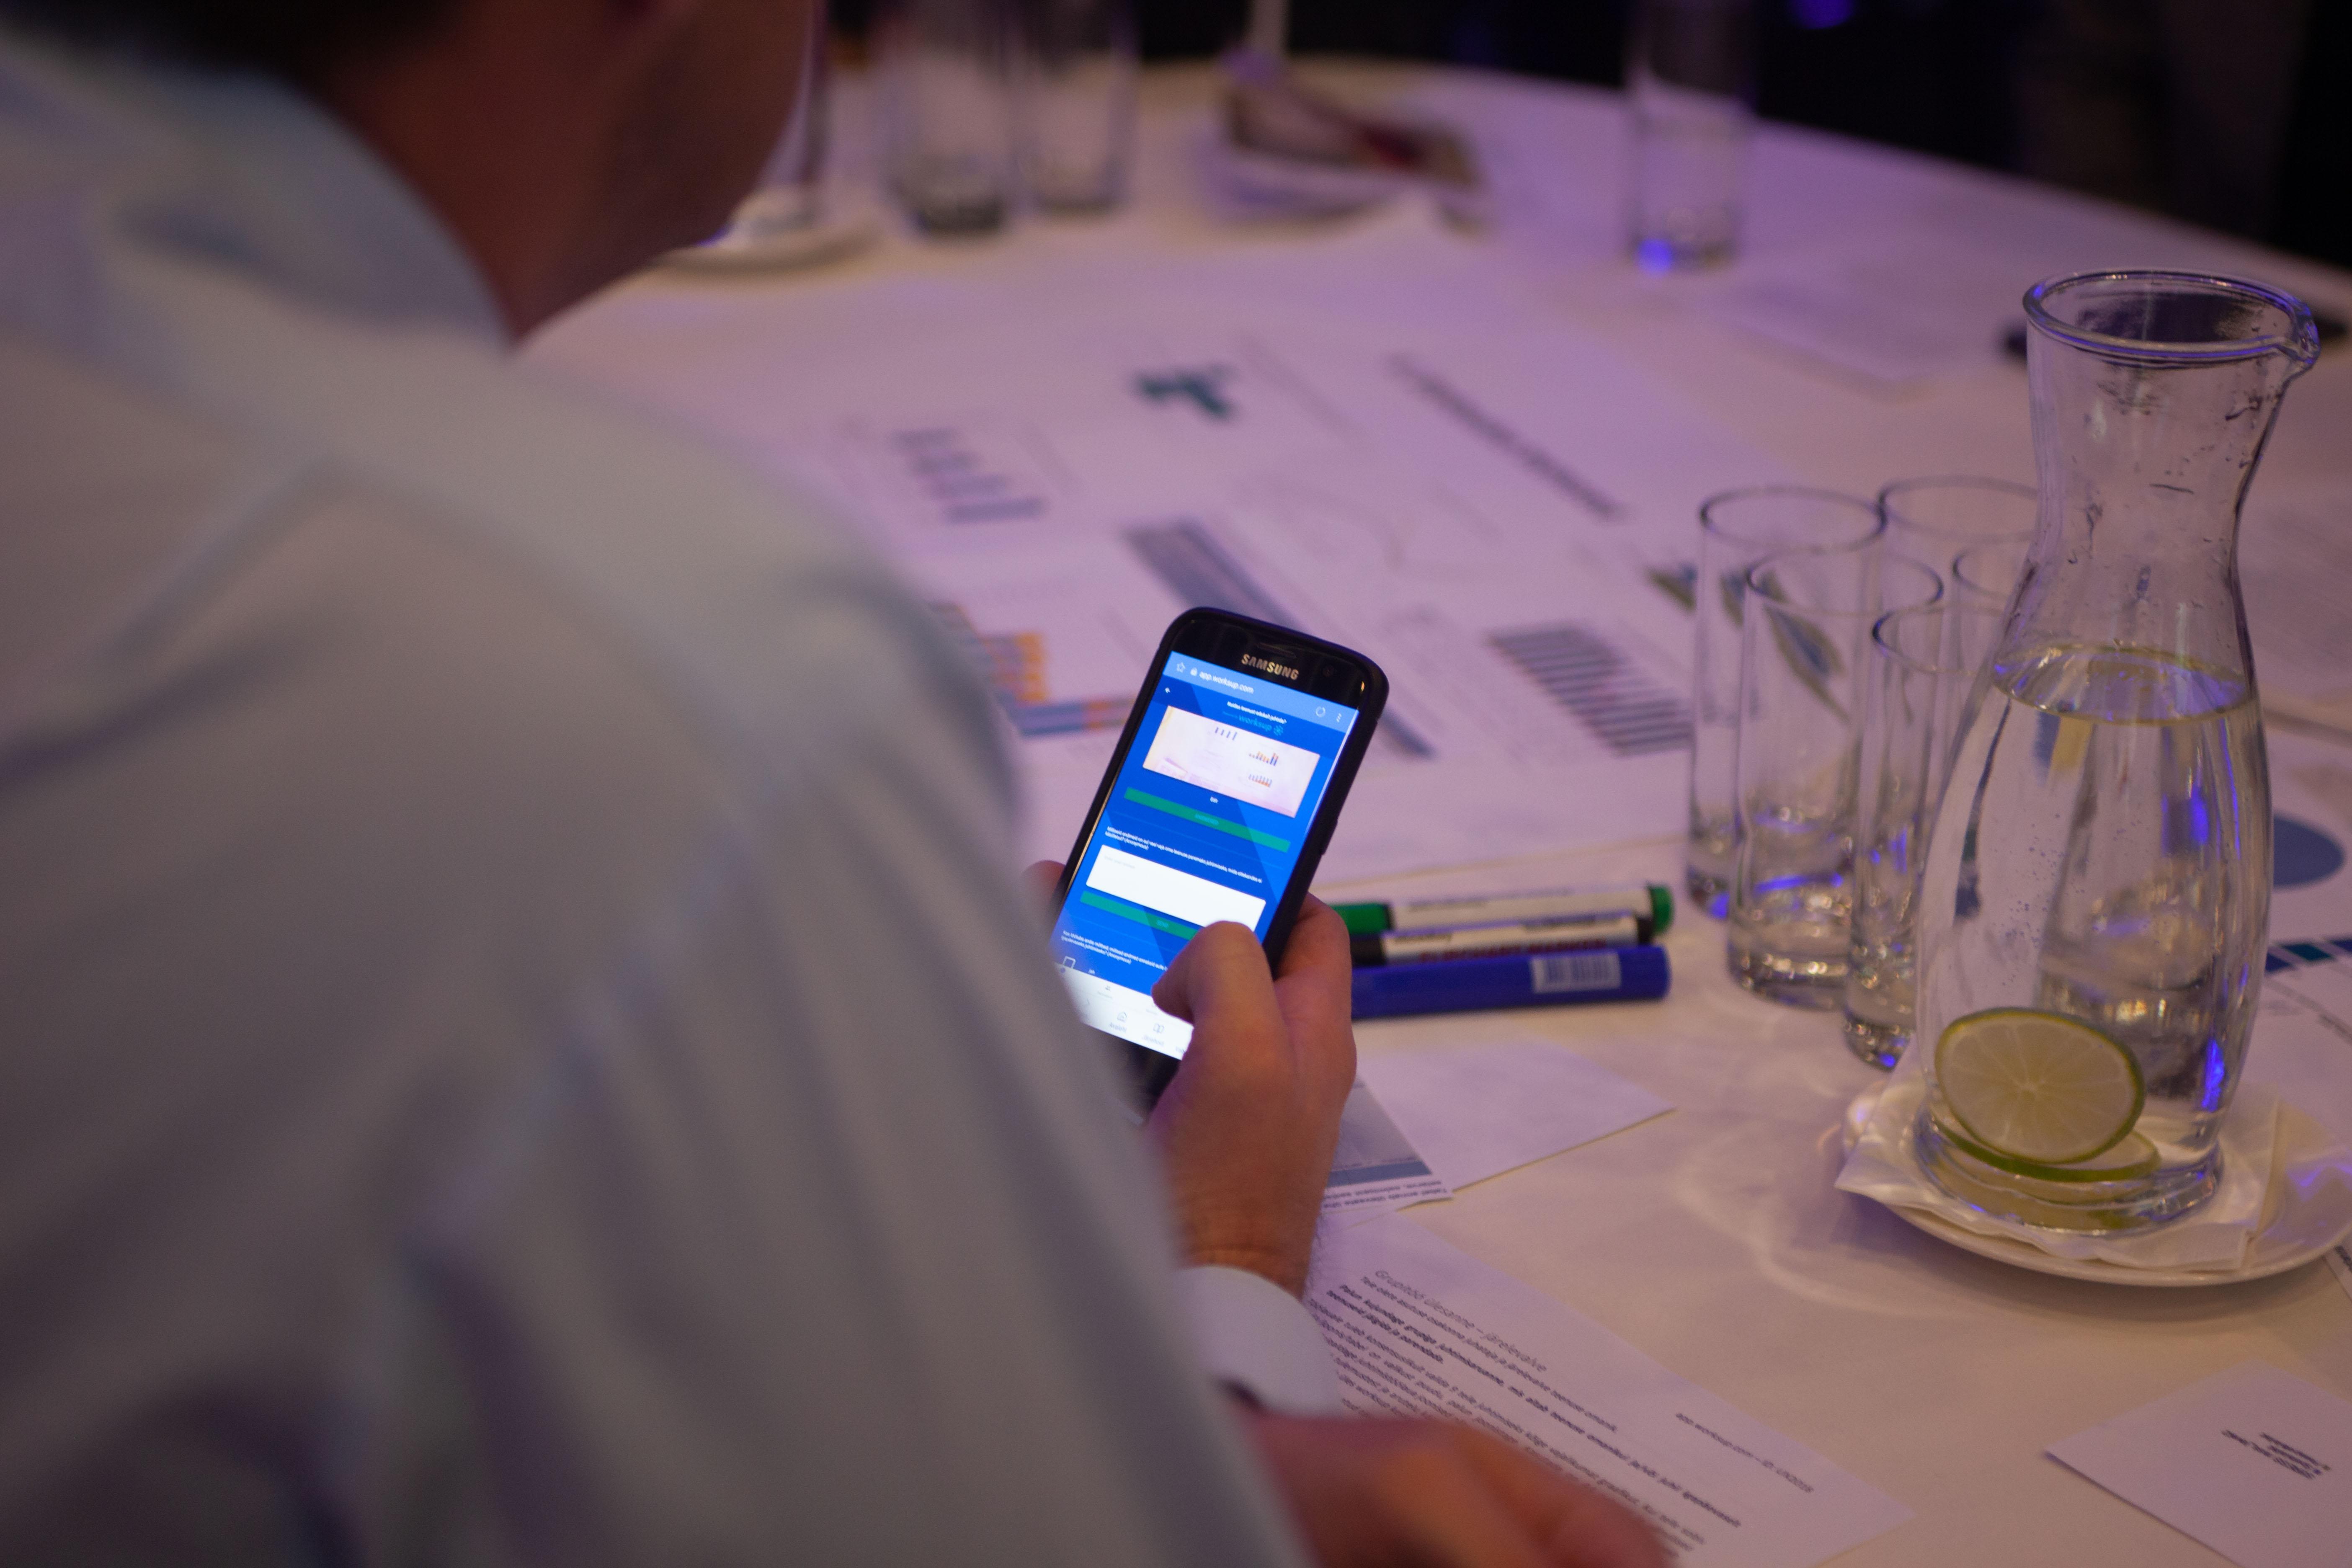 mobile event app, event app, conference app, best event apps, interaction app